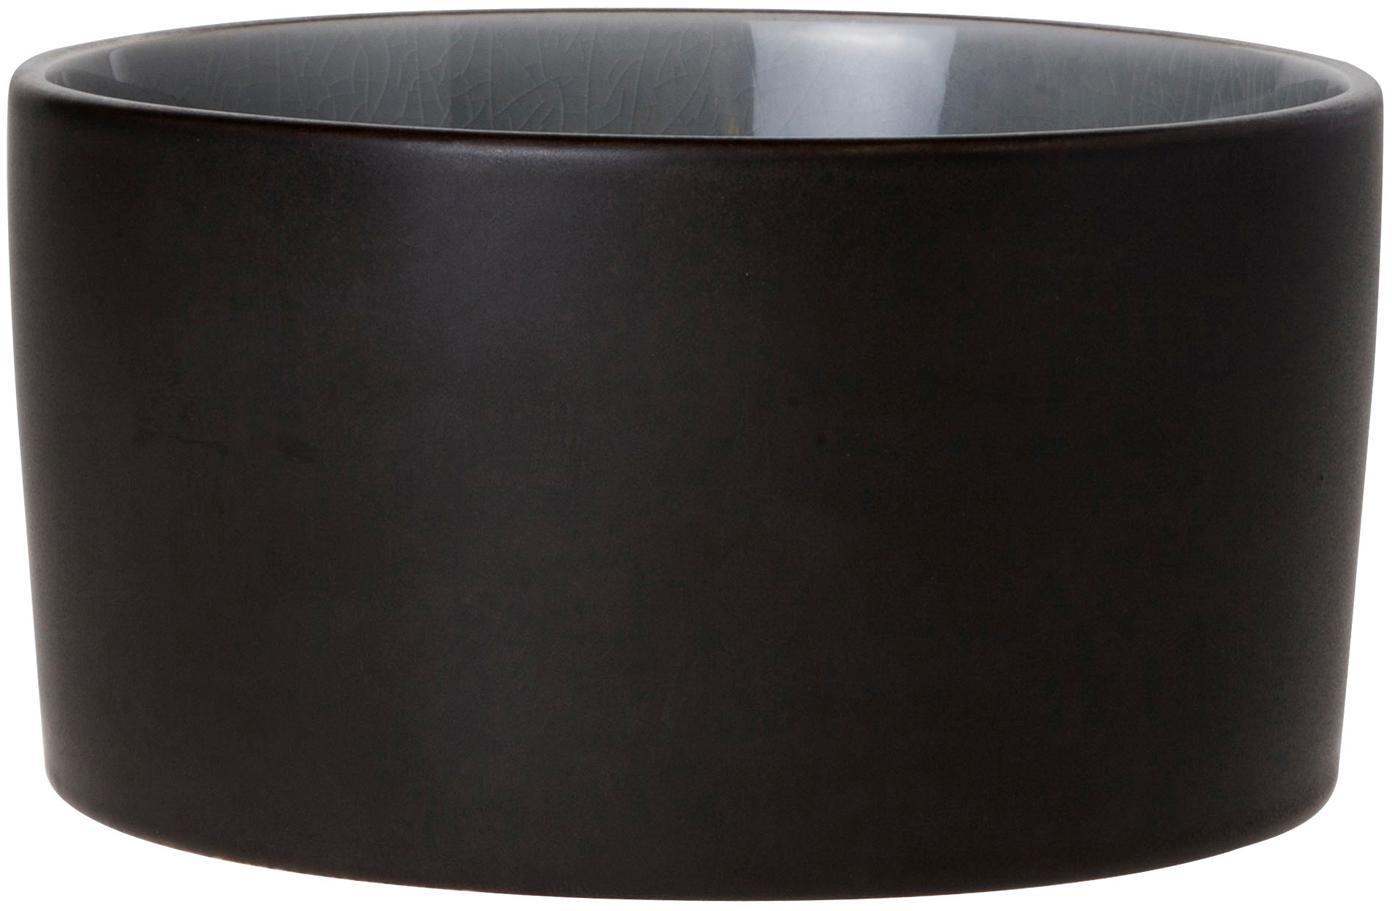 Ciotole Lagune, 2 pz., Ceramica, Marrone grigiastro, grigio chiaro, Ø 12 x A 6 cm